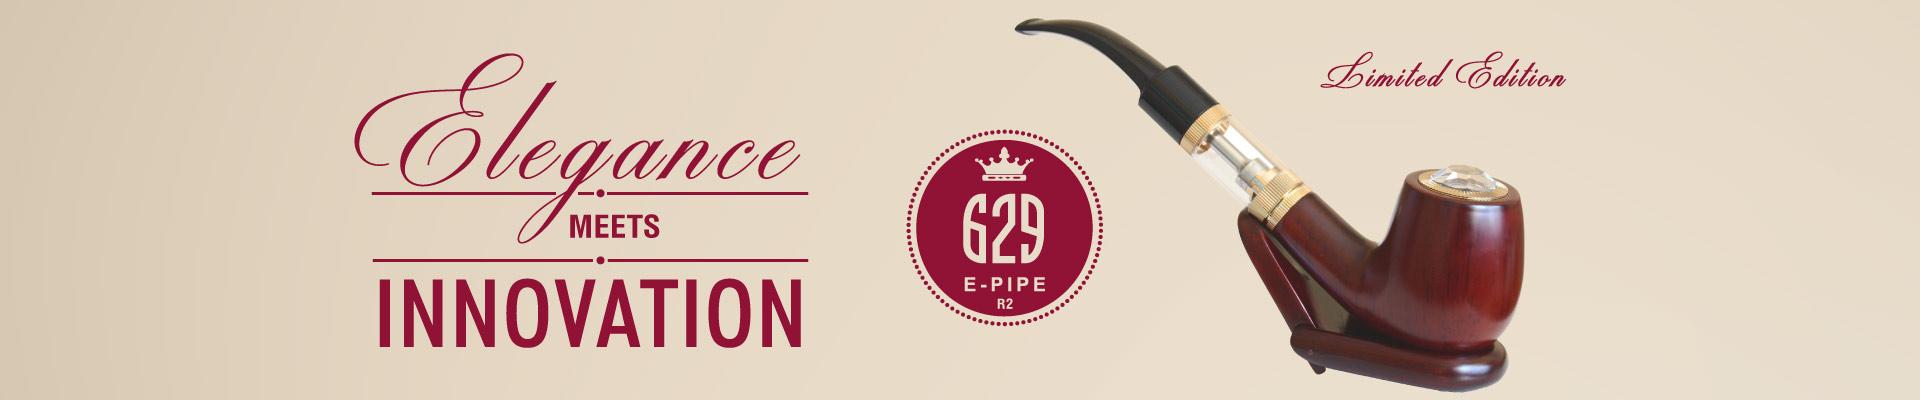 electronic pipe 629 vape mod